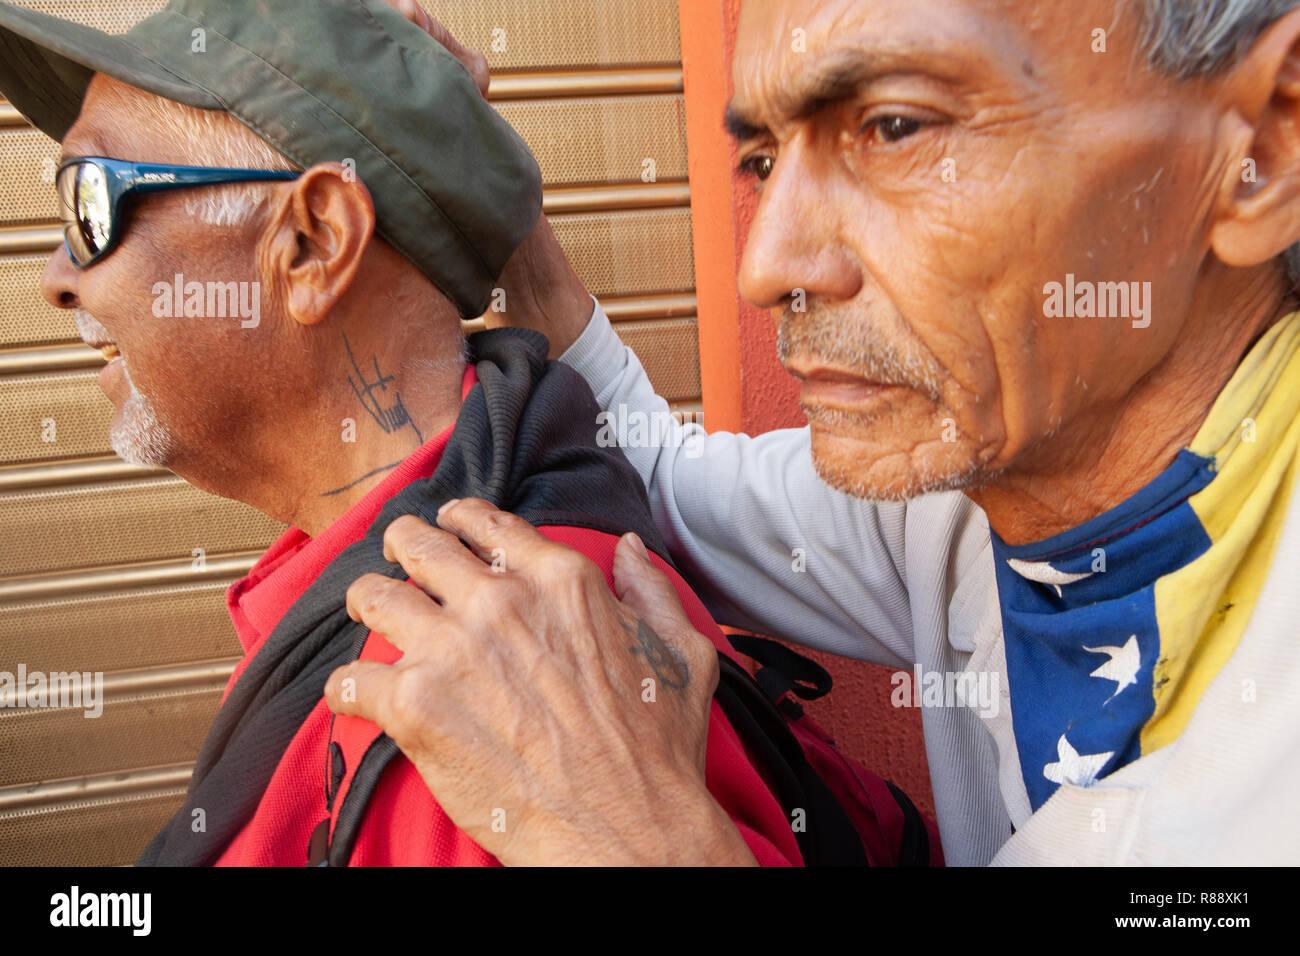 Two men with tattooed neck and hand wearing Venezuelan flag neckerchief, close up, Caracas, Venezuela, South America - Stock Image